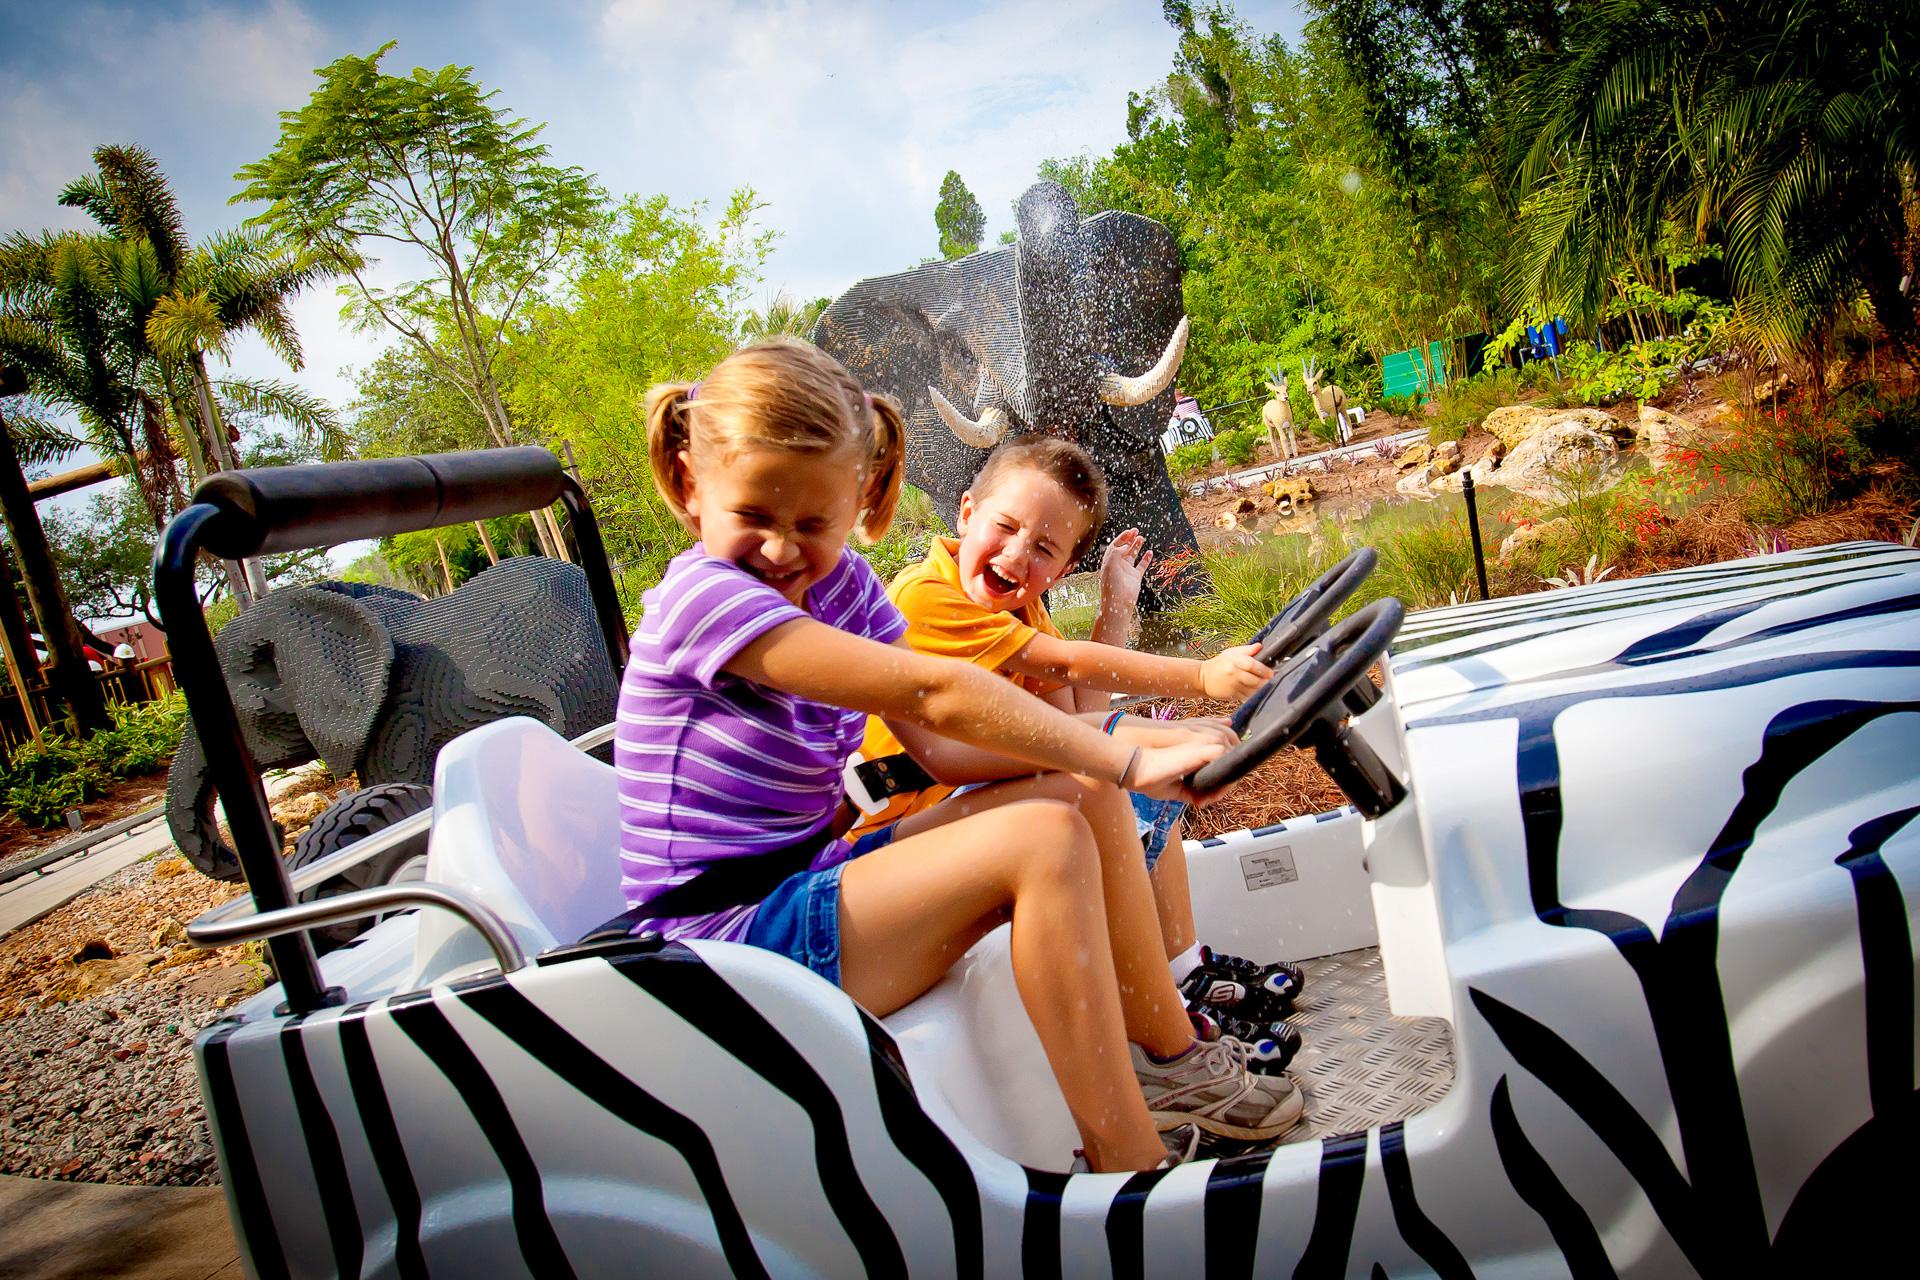 Kids at LEGOLAND Florida Resort; Courtesy of LEGOLAND Florida Resort